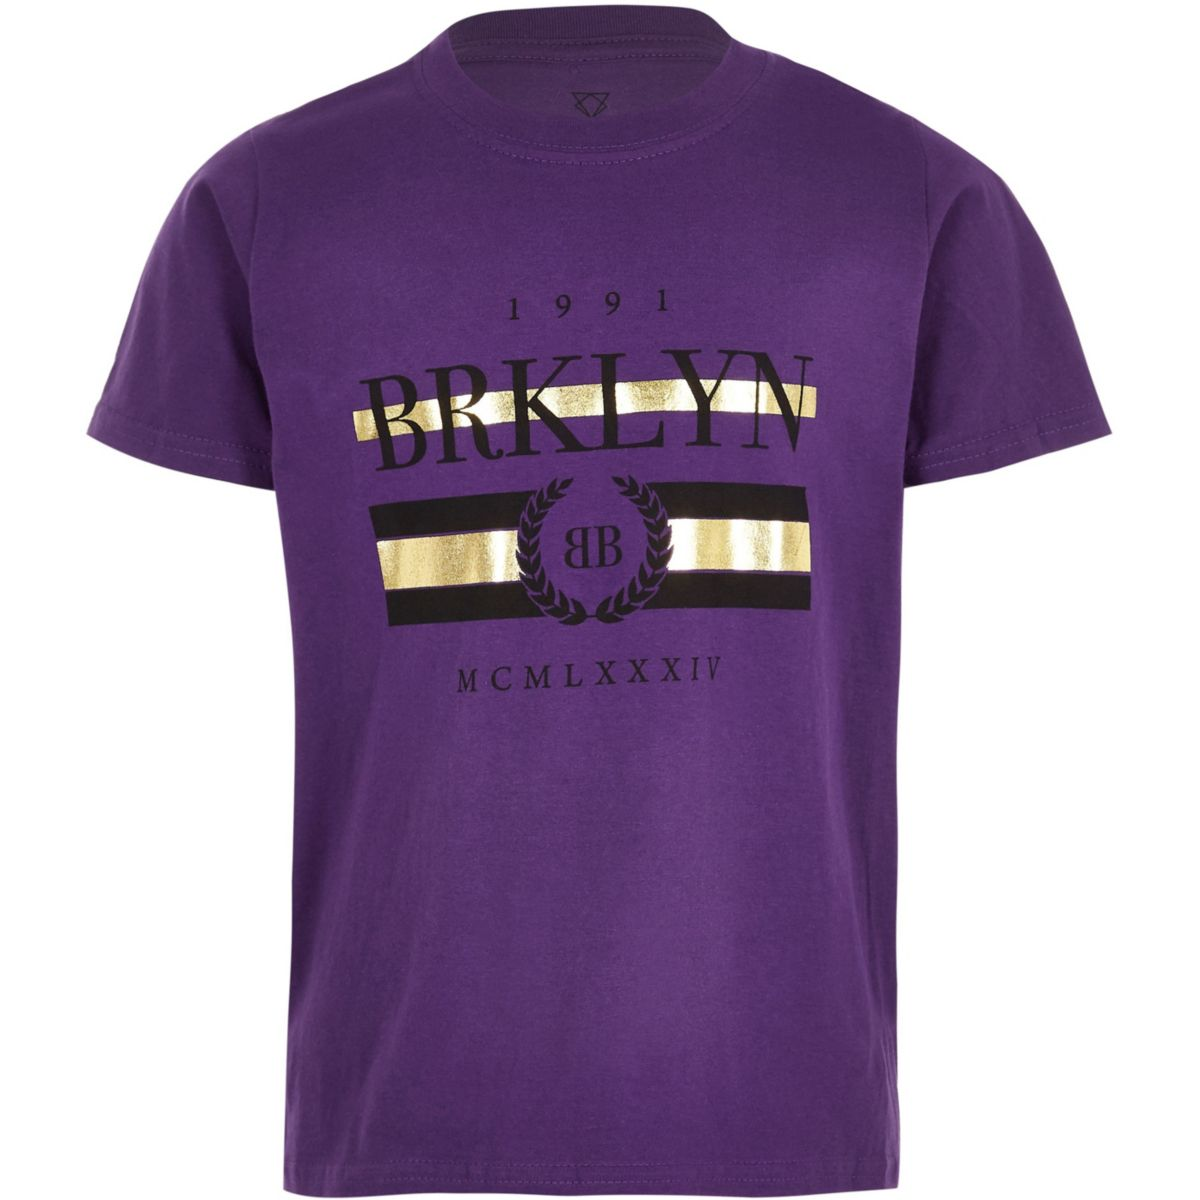 Boys purple 'Brklyn' short sleeve T-shirt